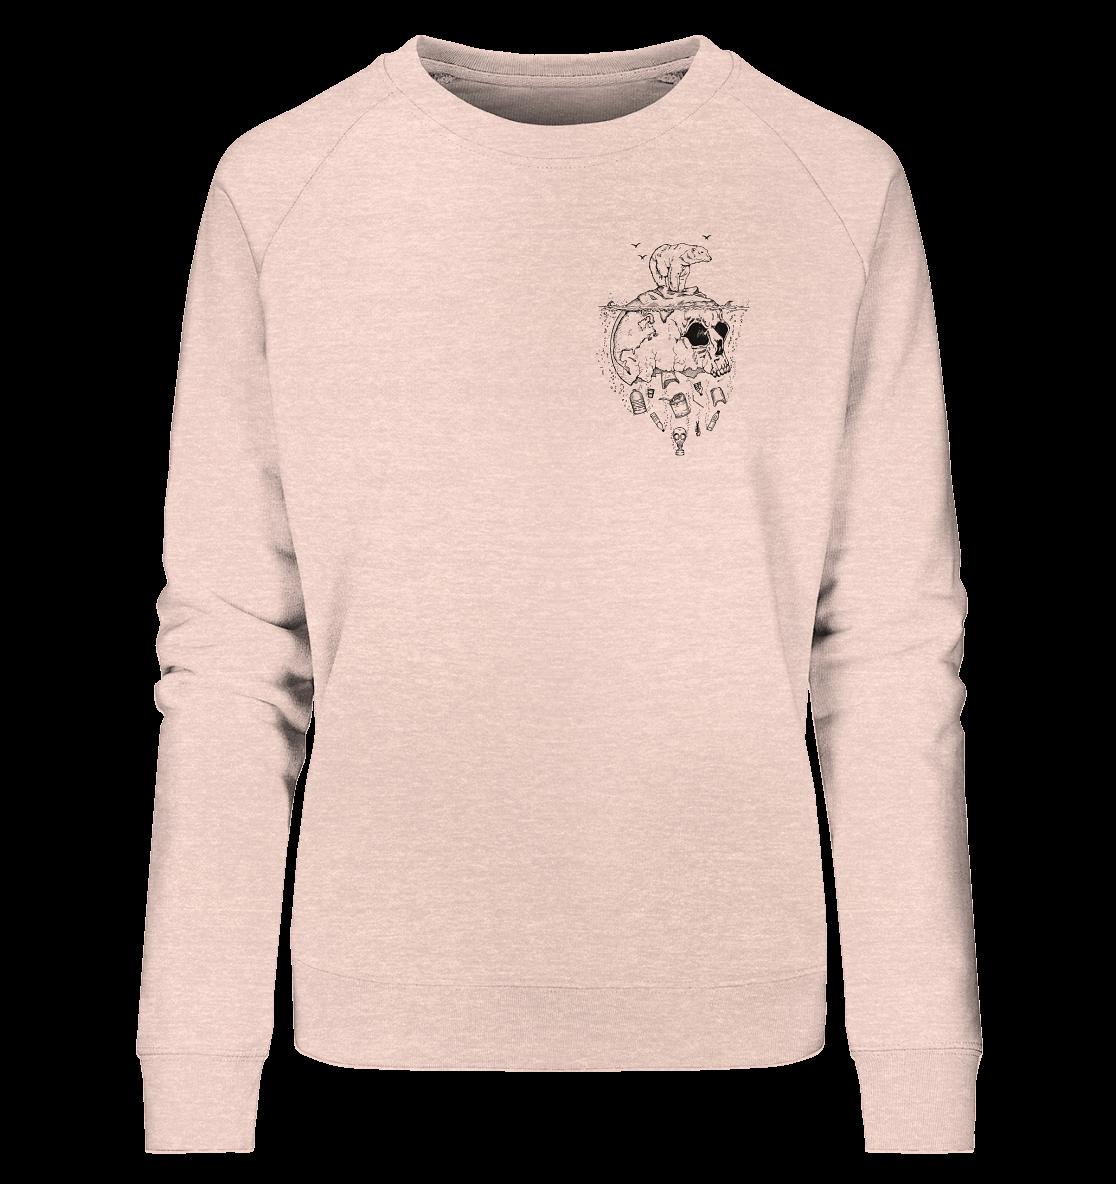 front-ladies-organic-sweatshirt-ffded6-1116x-21.png